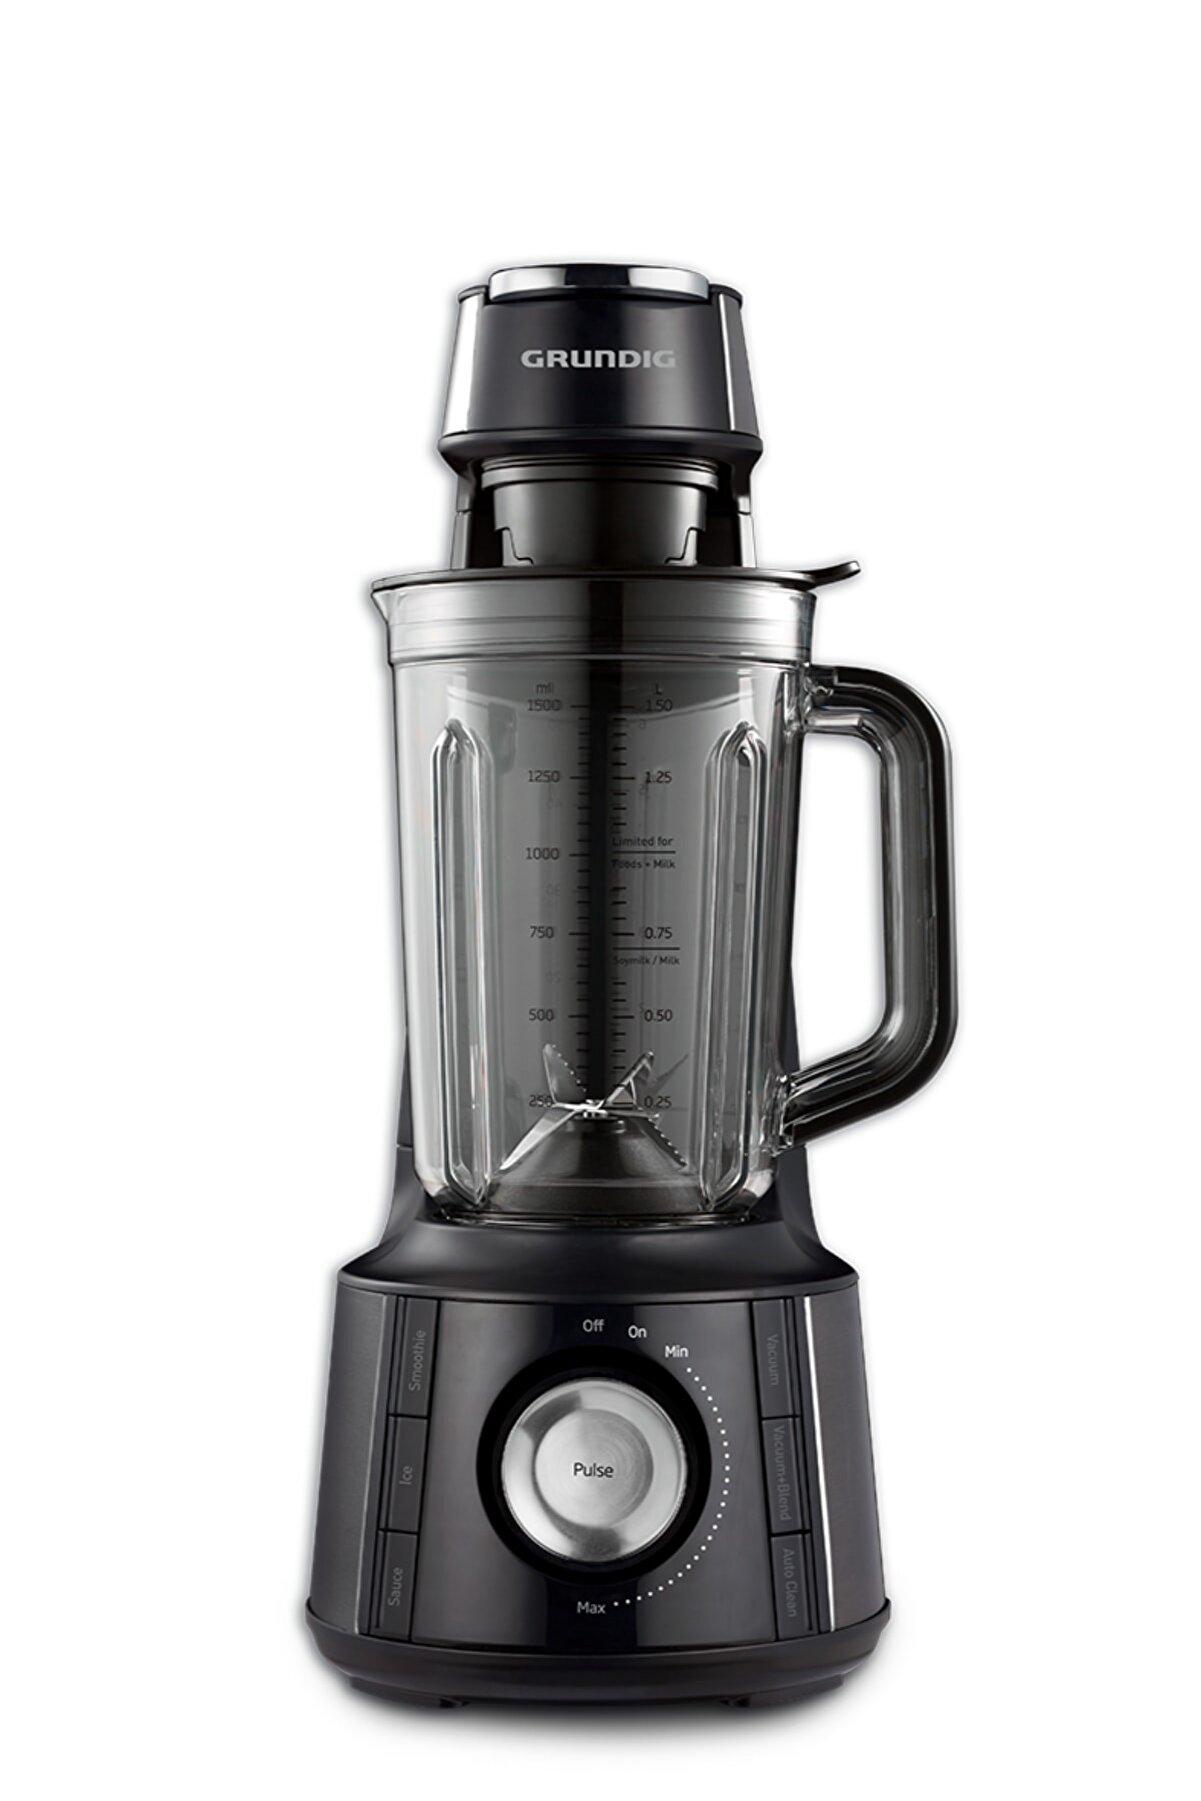 Grundig VB 8760 Professional Line Vacuum Blender - 1000 Watt